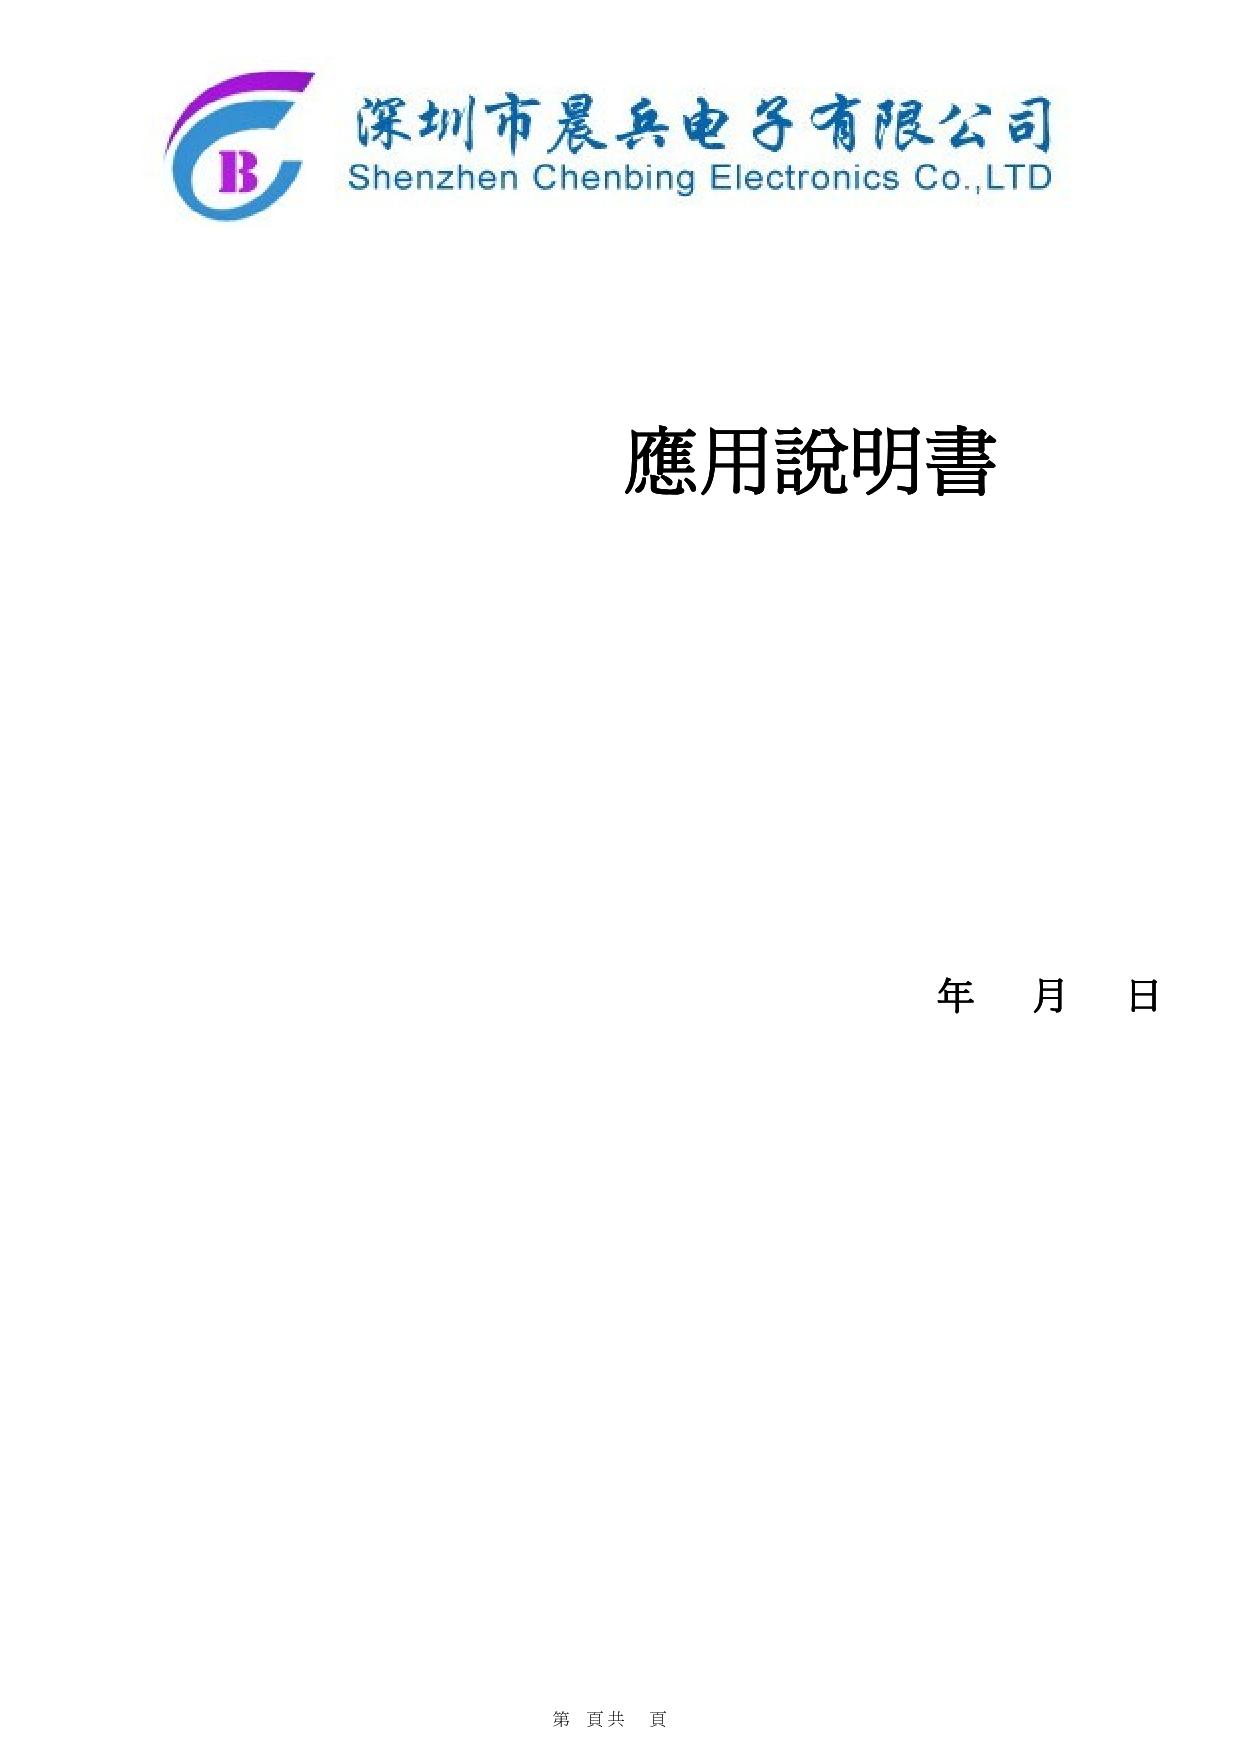 GPD2856A image